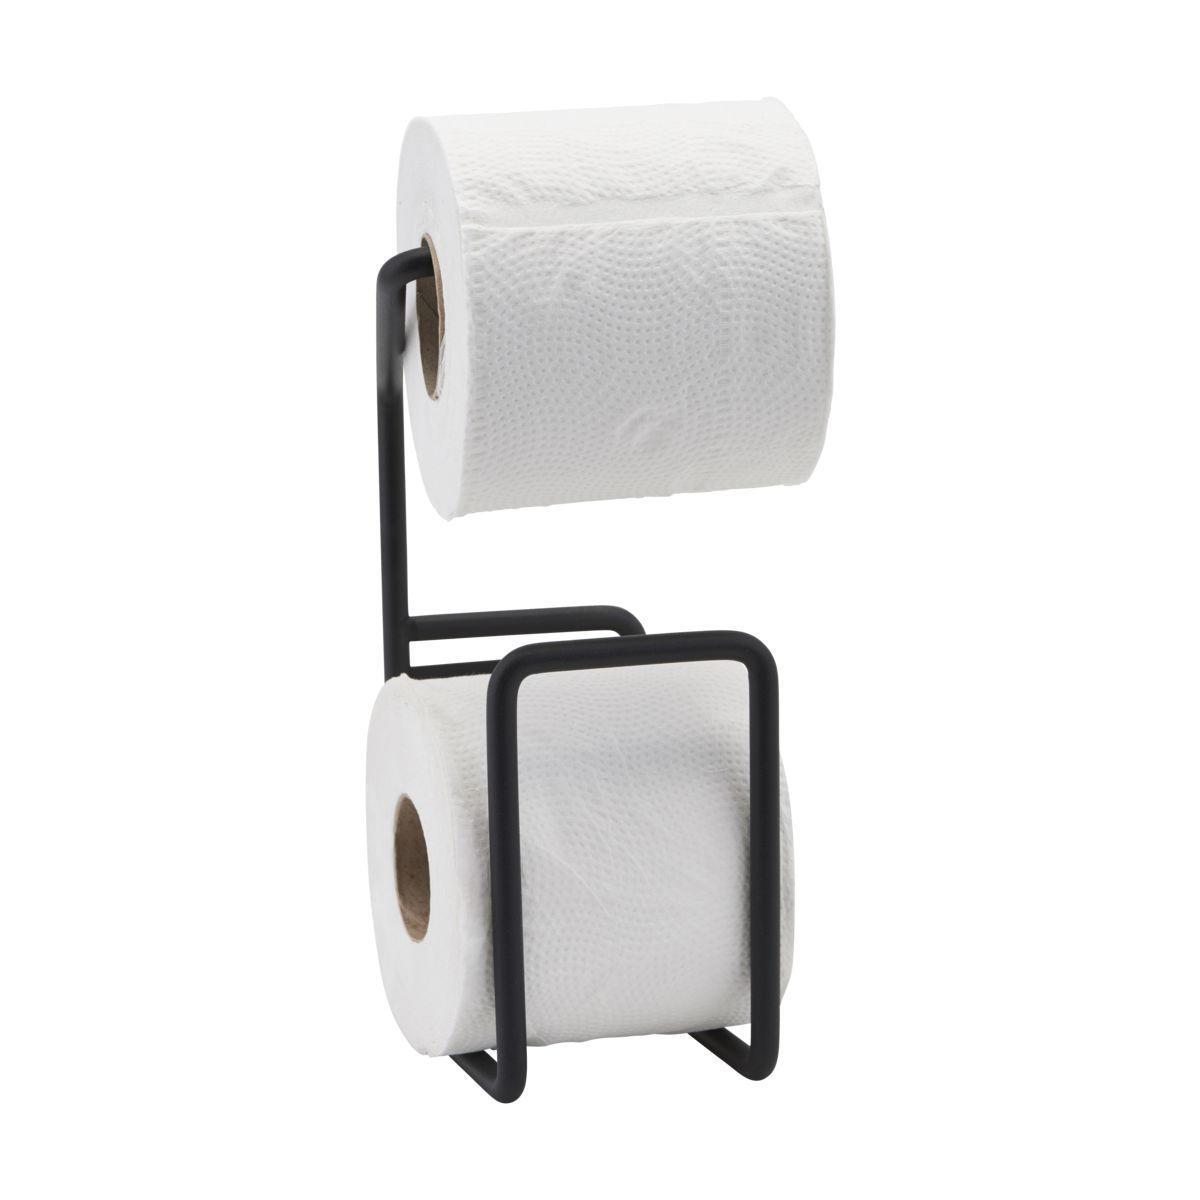 House Doctor Držák na toaletní papír Via Black, černá barva, kov